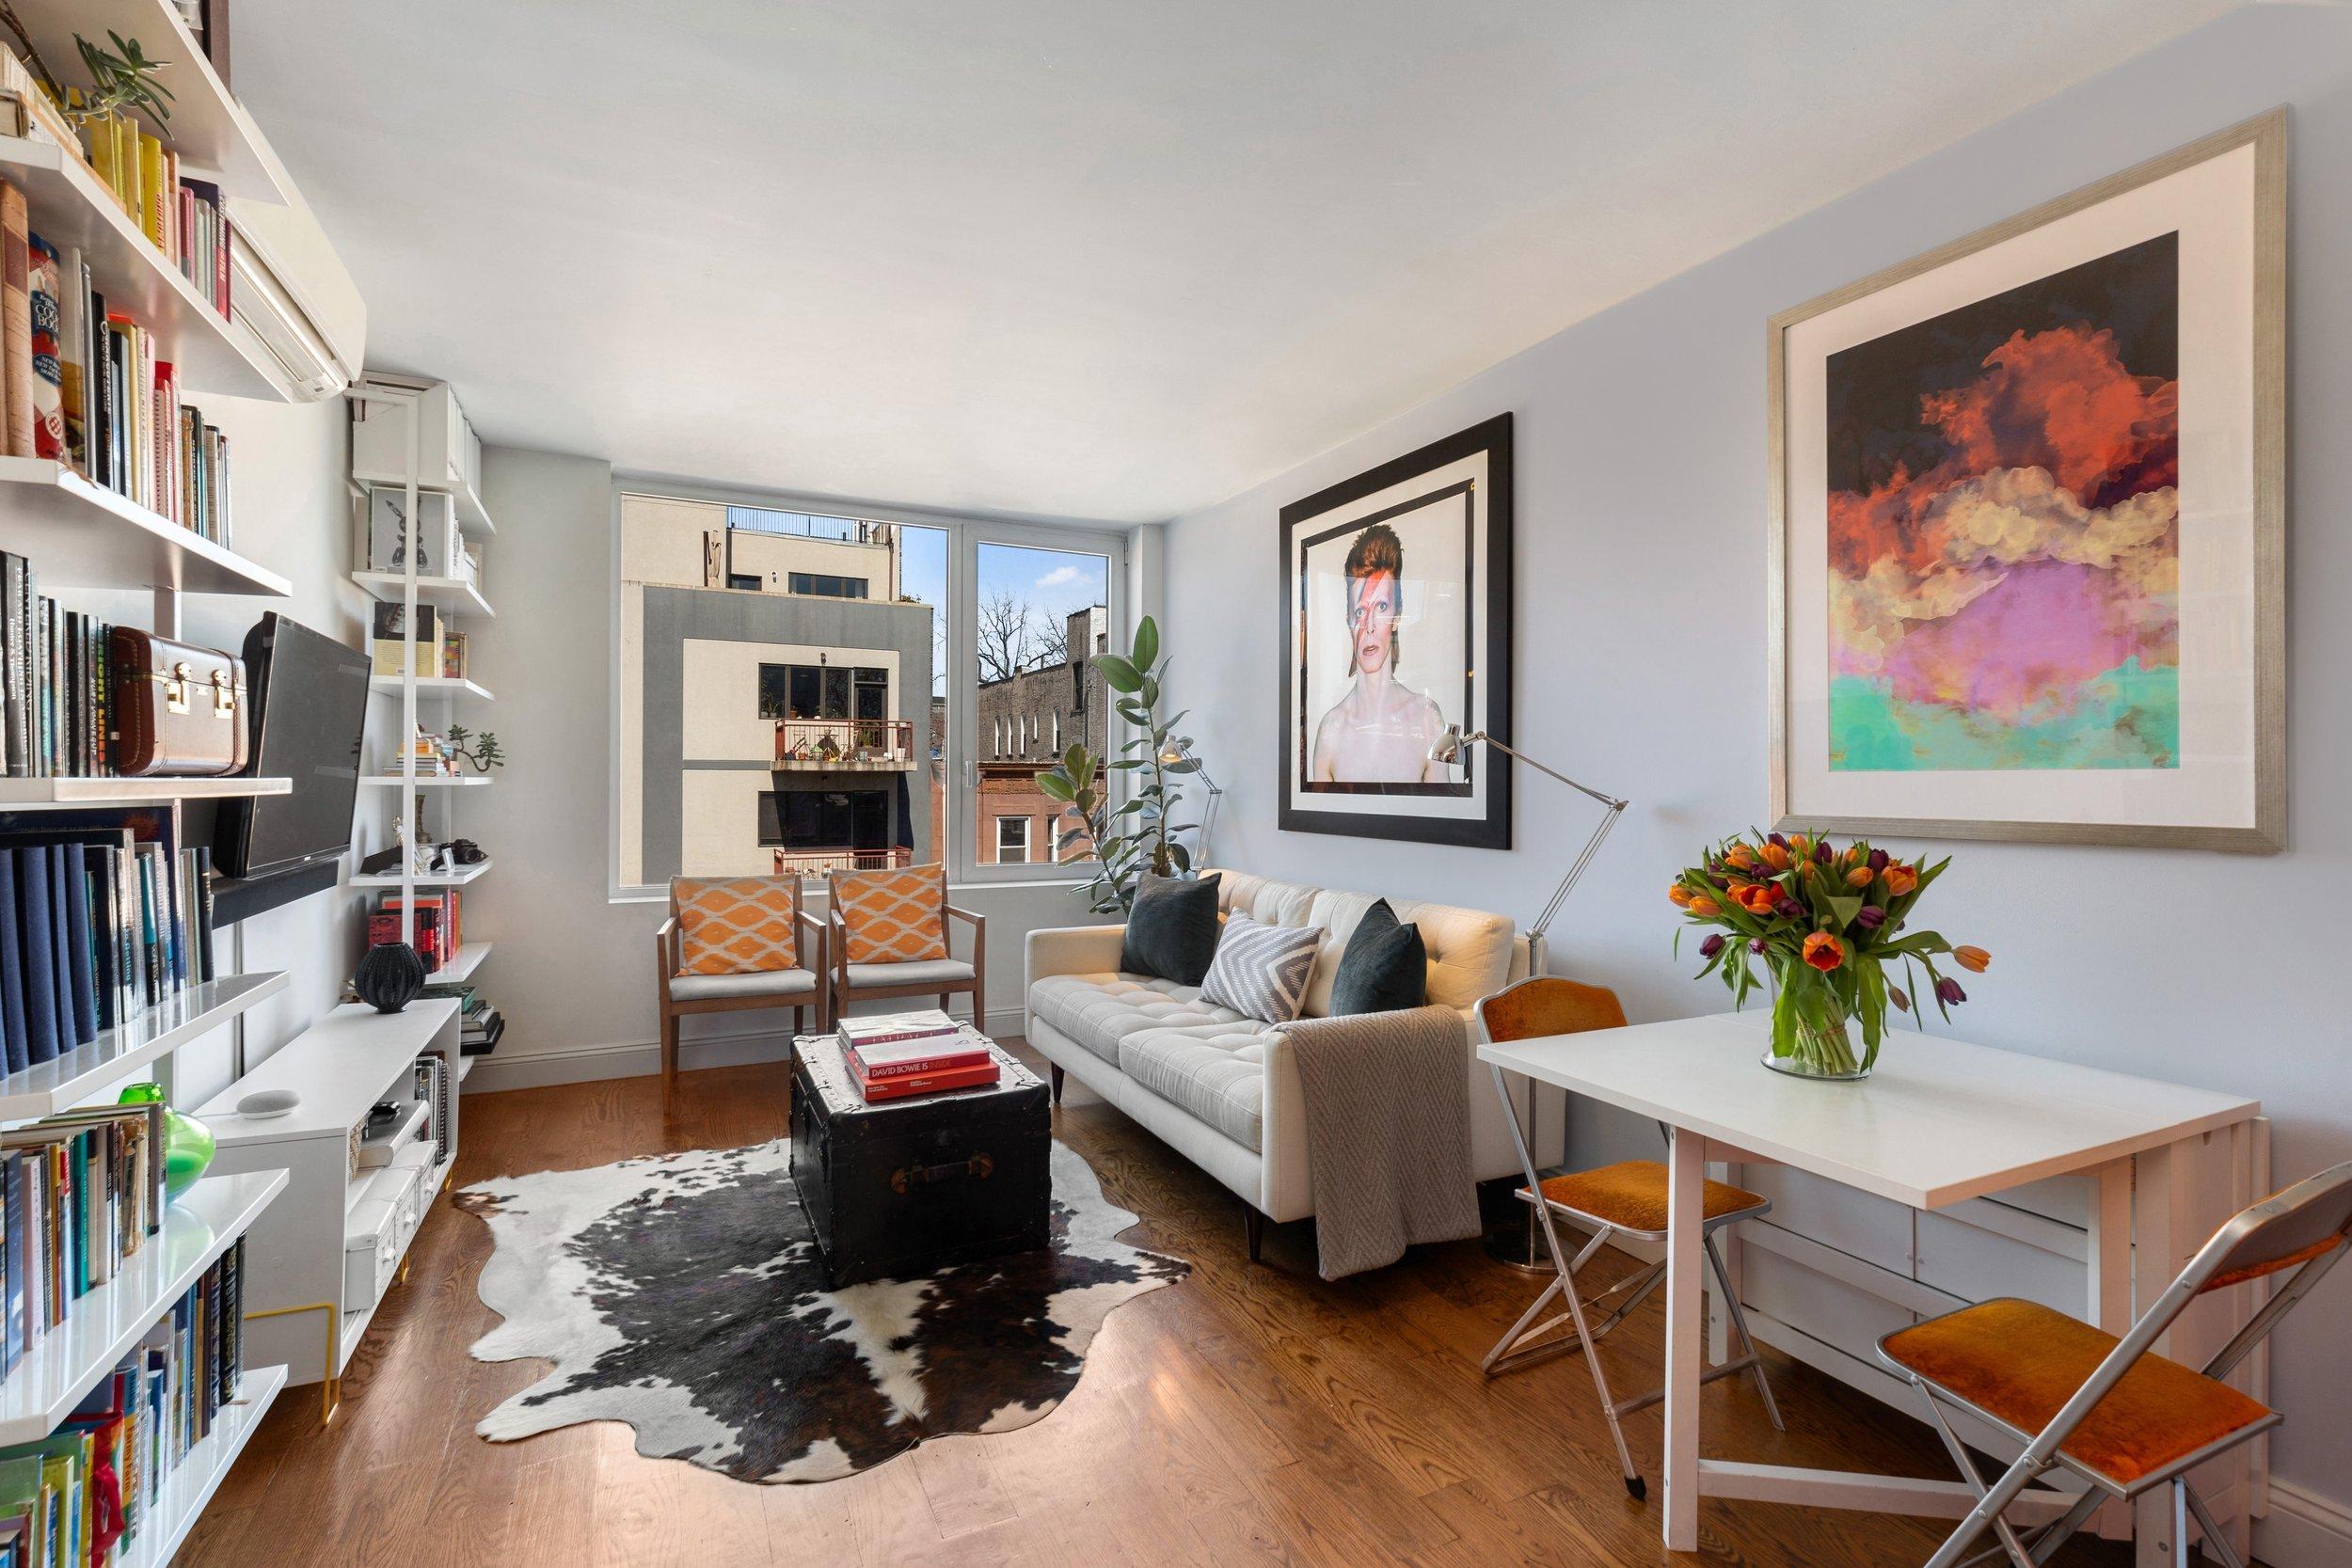 954 Bergen Street - Apt. 4dP, crown Heights, bk